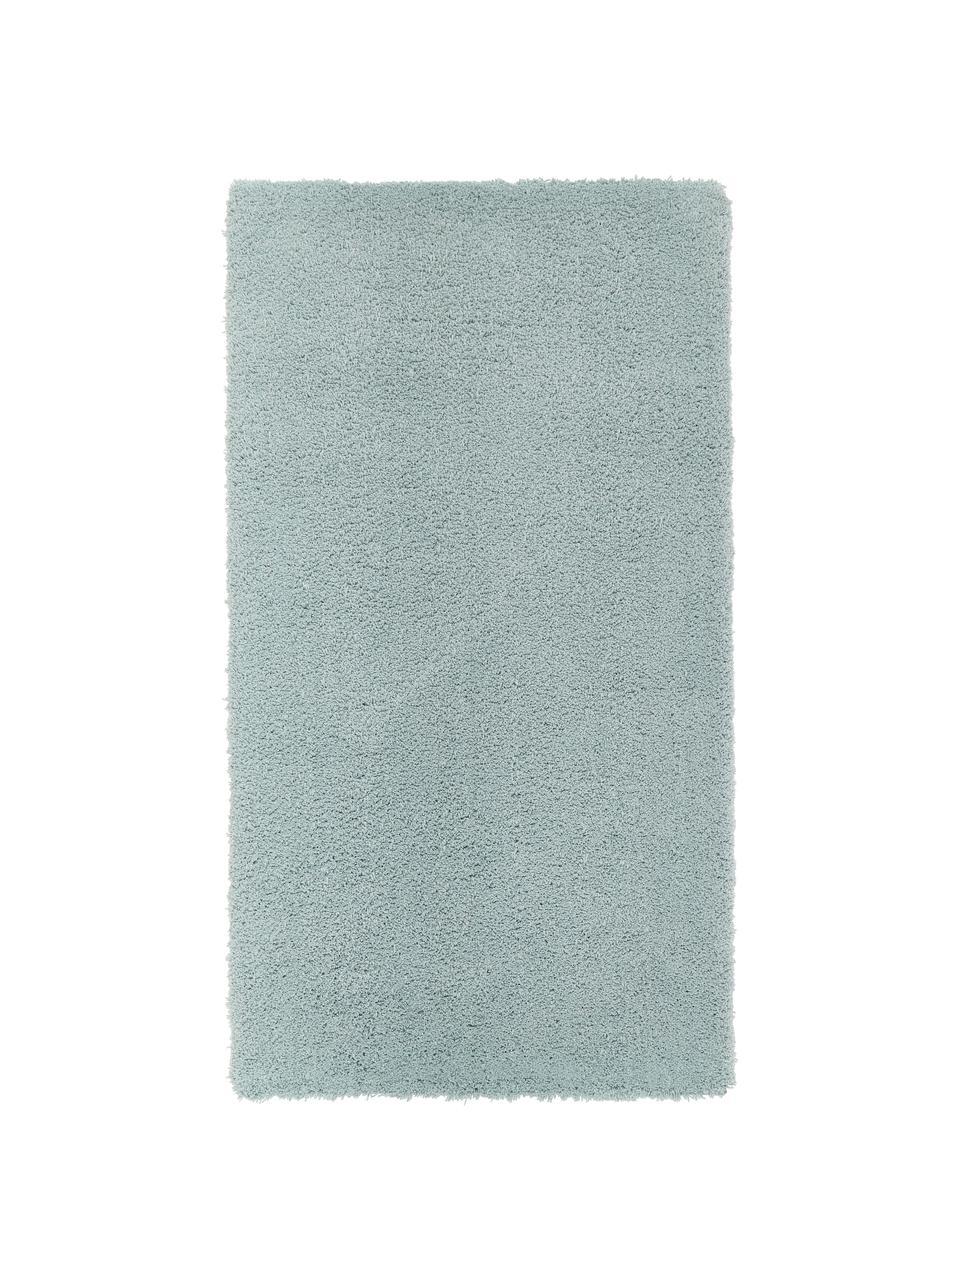 Tappeto morbido a pelo lungo verde menta Leighton, Retro: 70% poliestere, 30% coton, Verde menta, Larg.160 x Lung. 230 cm  (taglia M)